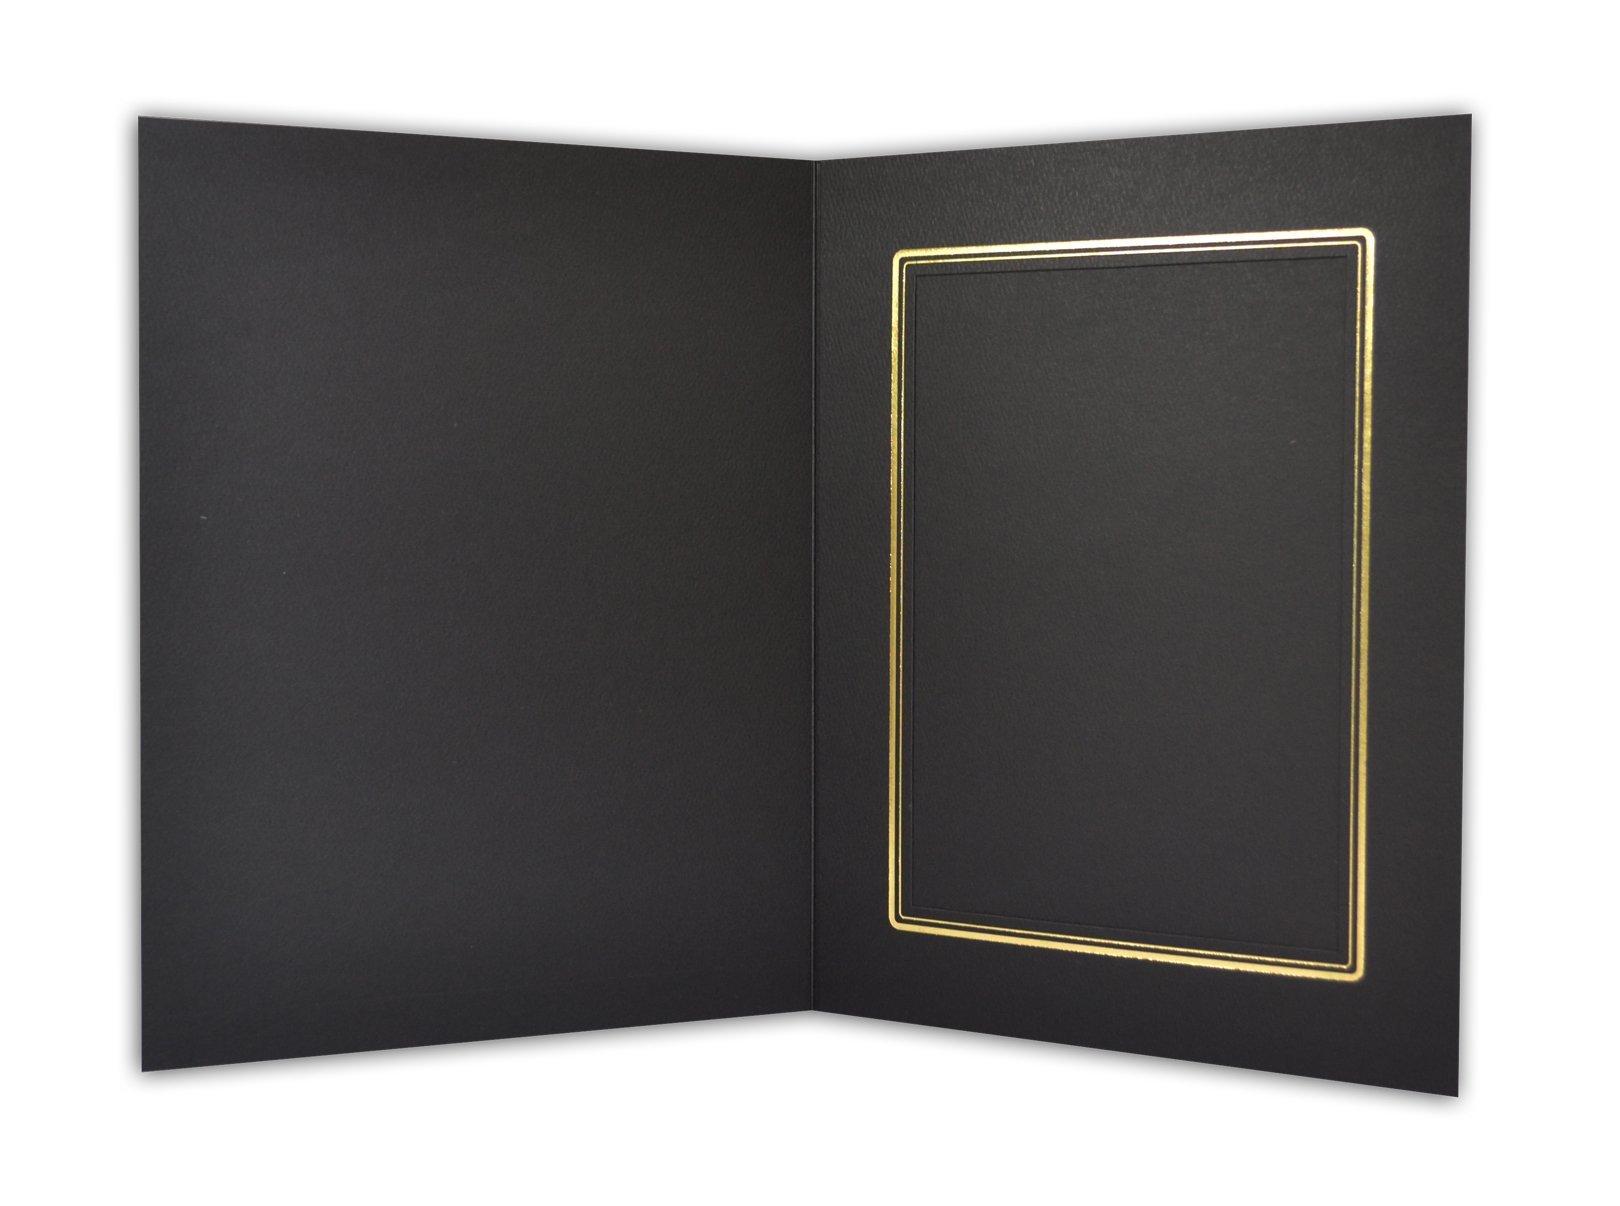 Golden State Art, Black Cardboard Photo Folder for a 5x7 Photo - 50 Pack